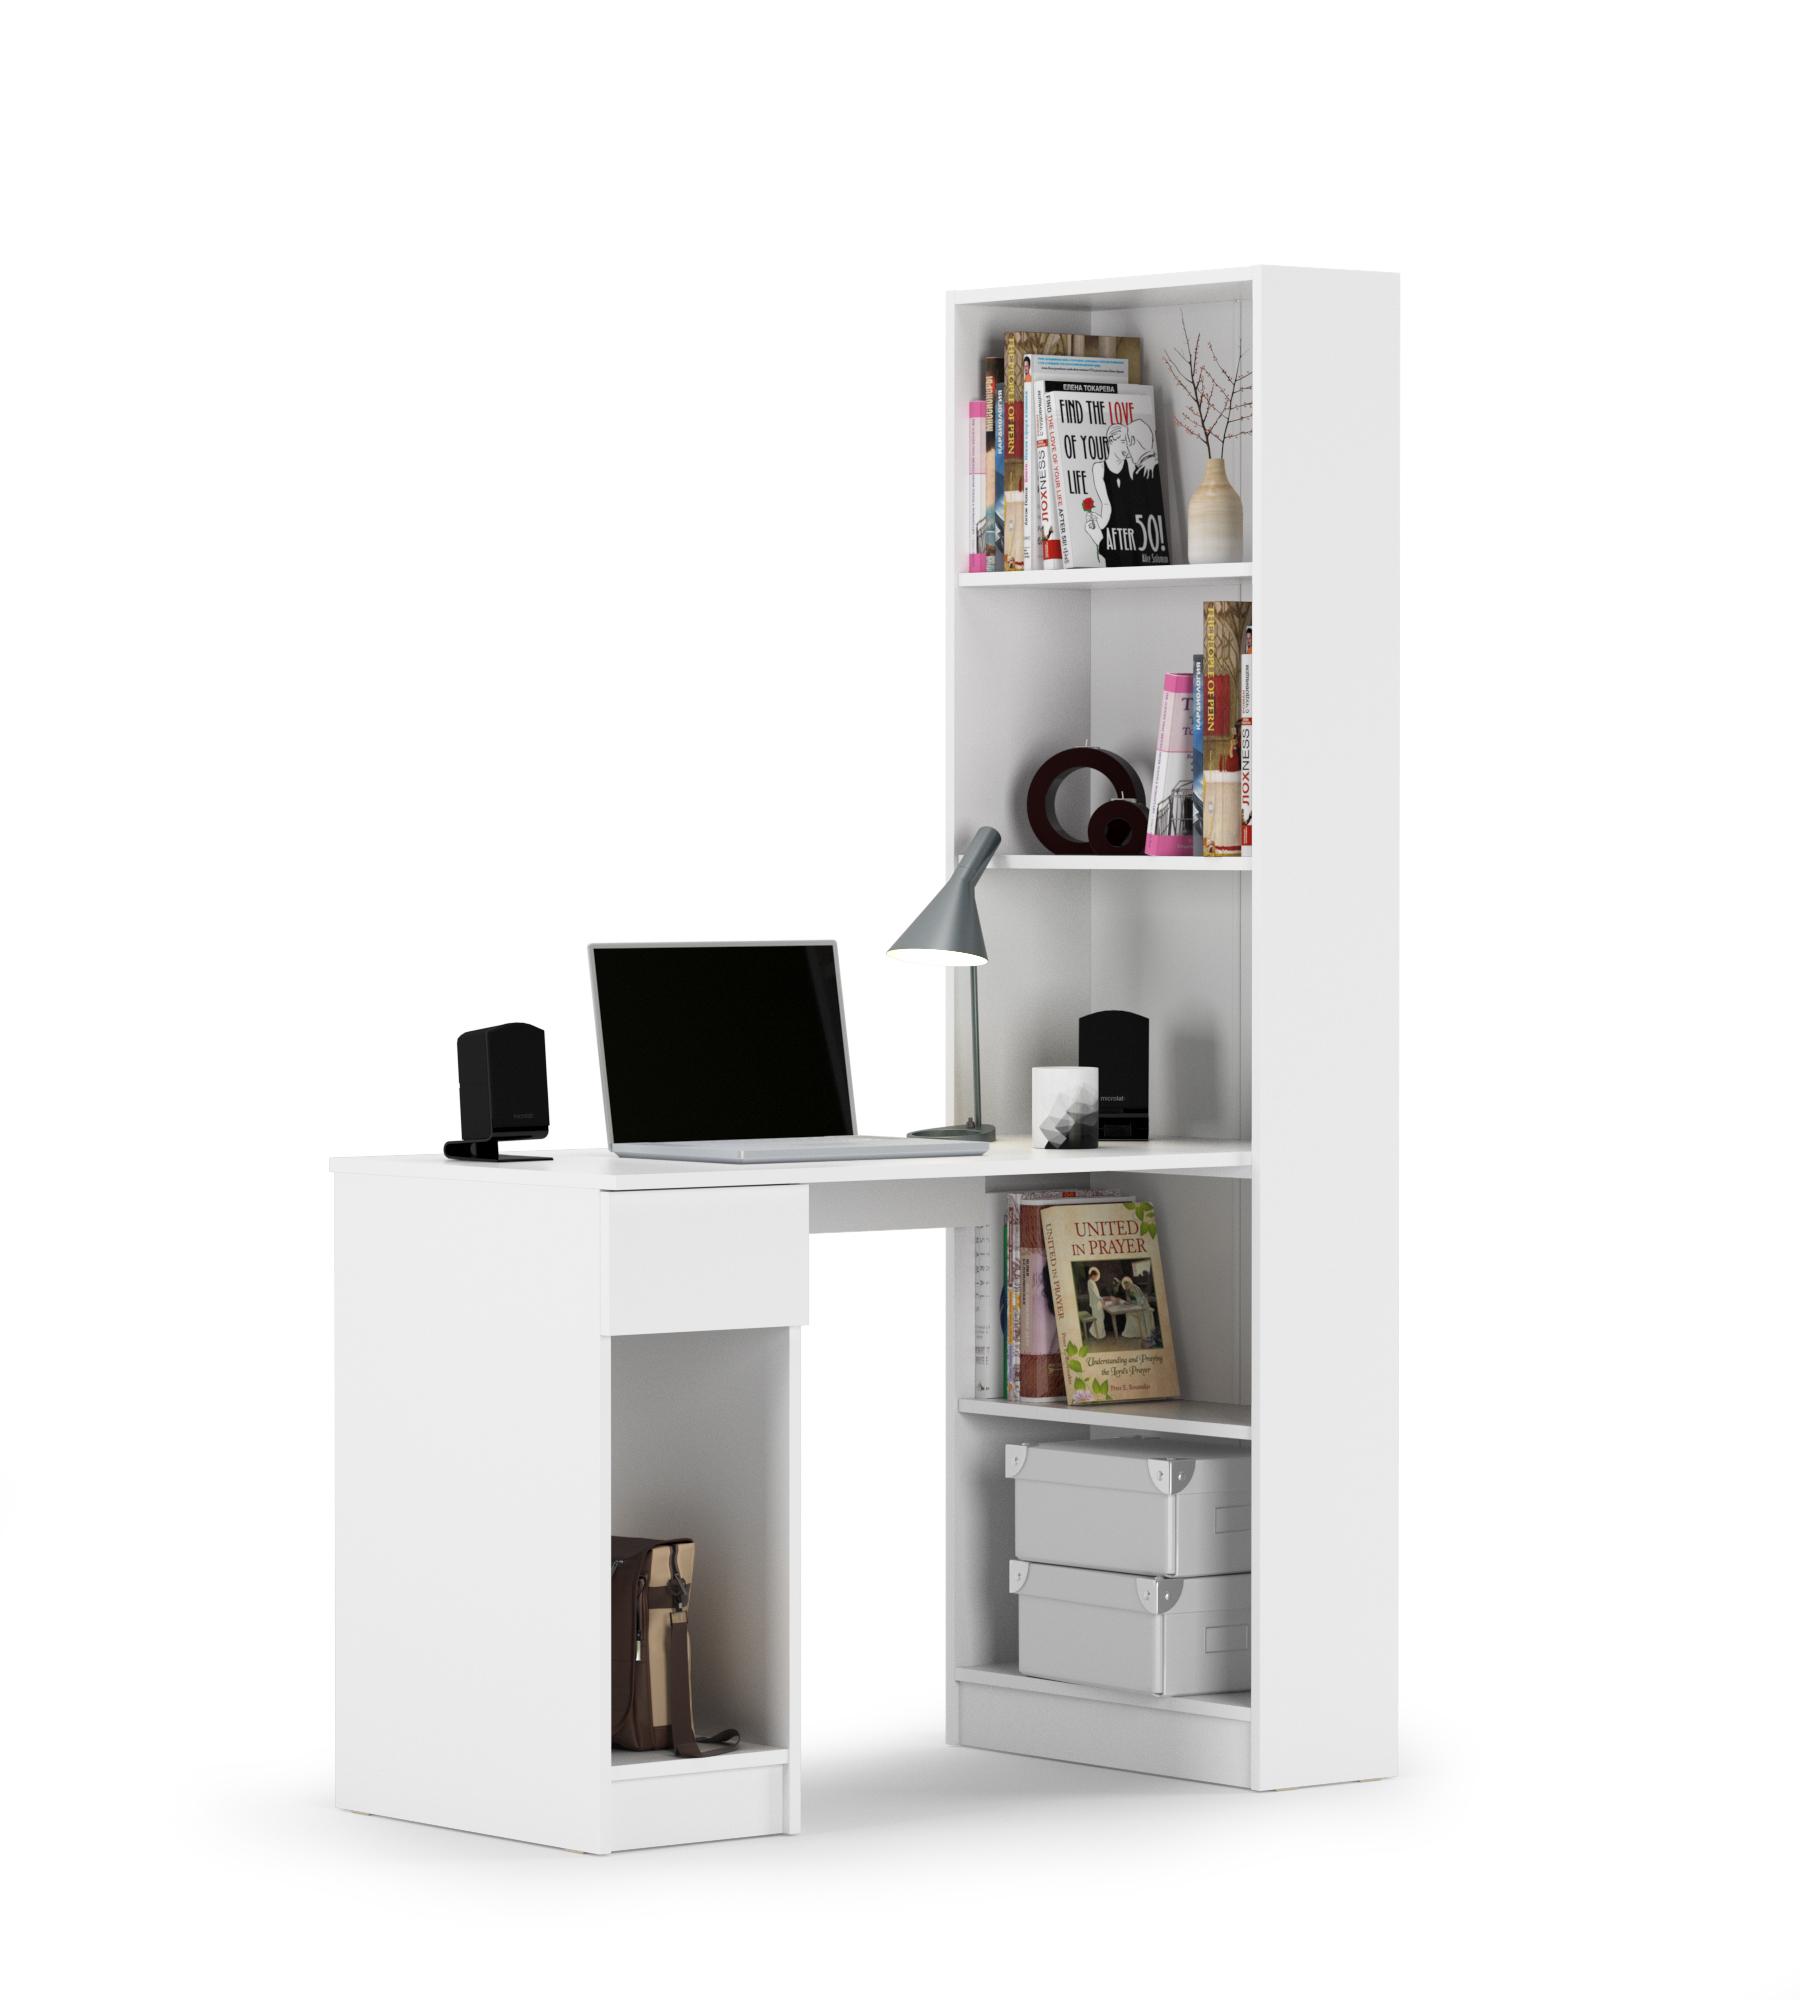 Стол компьютерный Mobi Лайт 10.01 белый, ШхГхВ 115,3х58,2х179 см., универсальная сборка